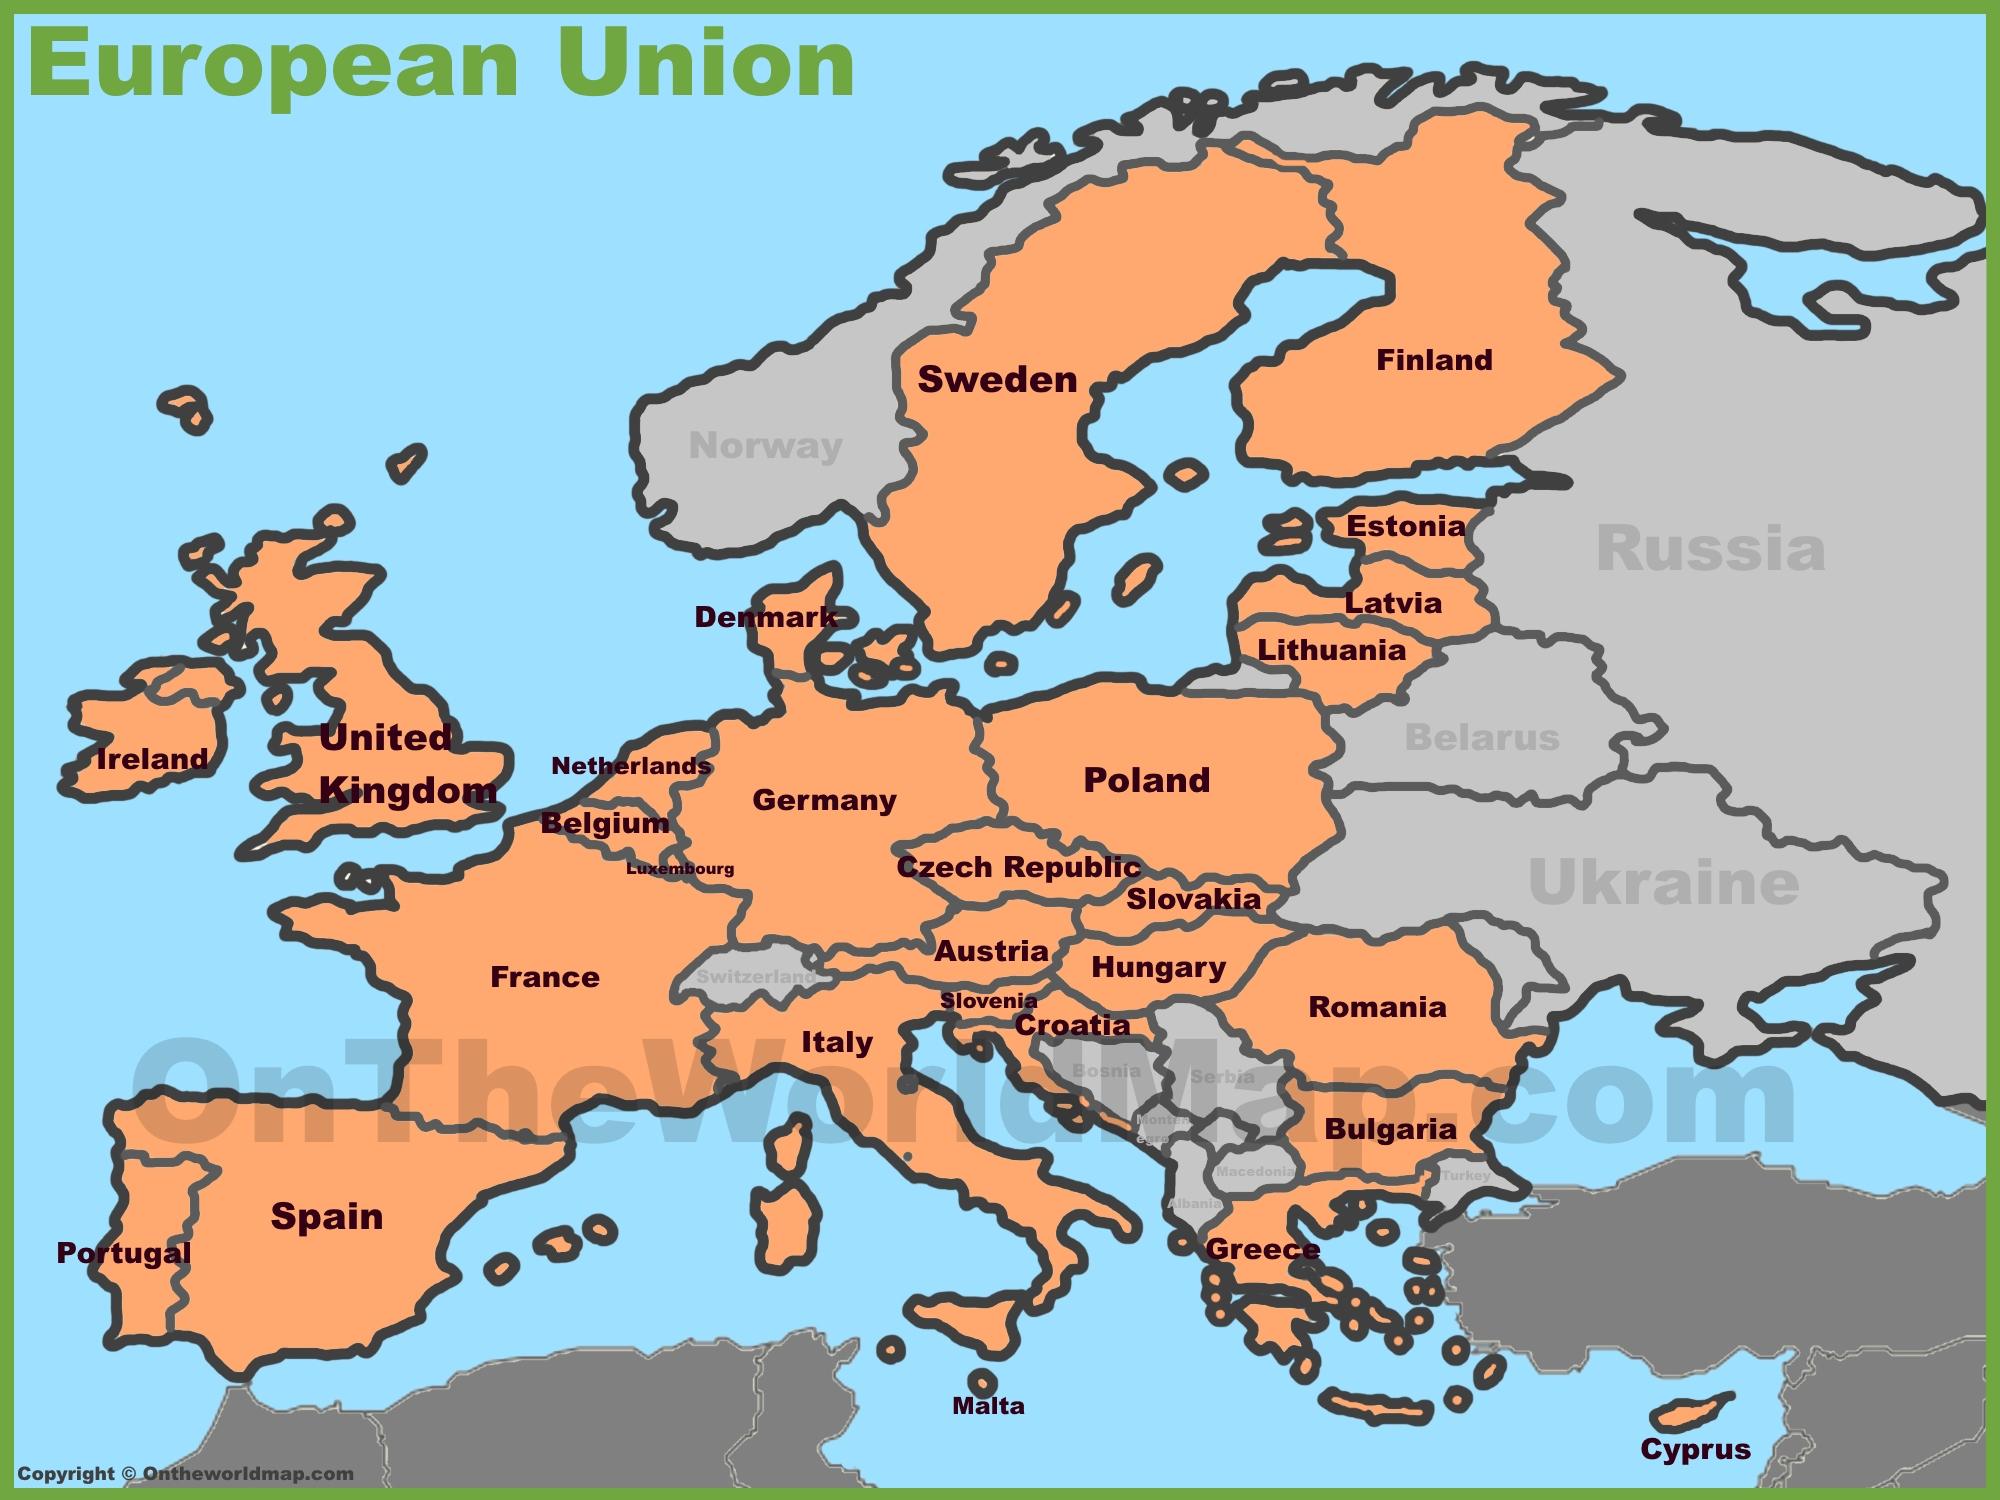 Map Of Eu Countries European Union countries map Map Of Eu Countries